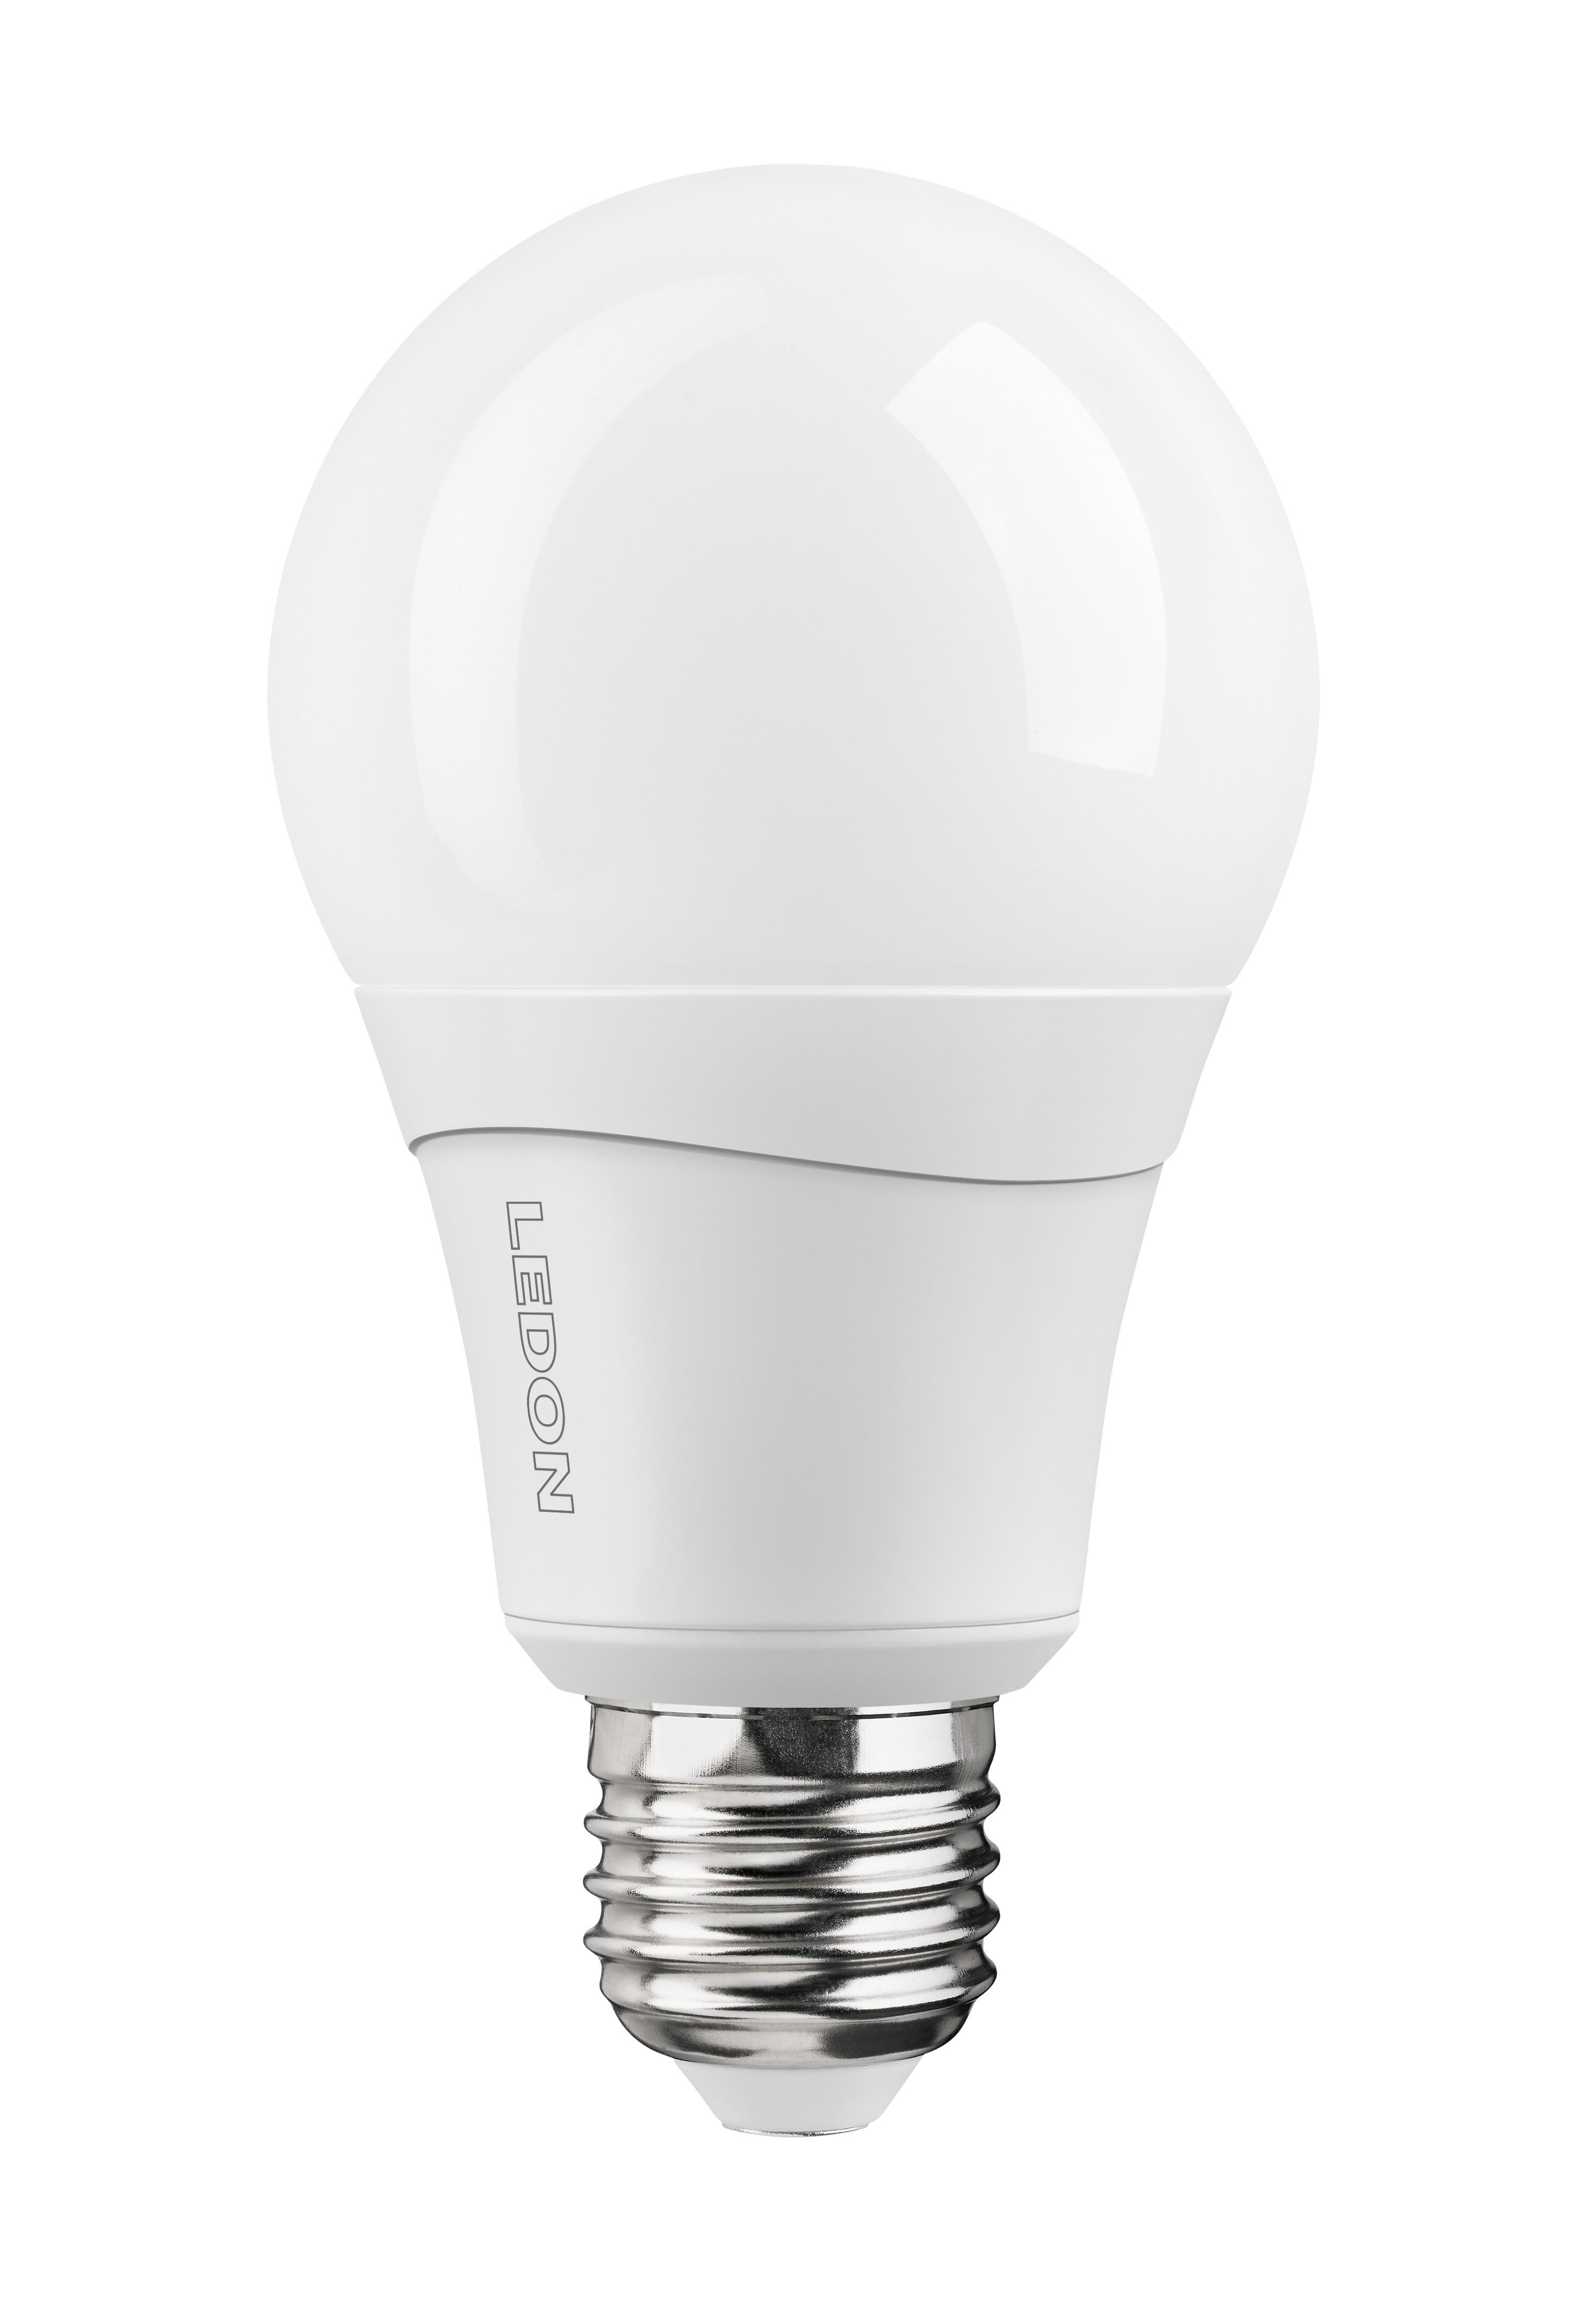 1 Stk LED Lampe A66 12.5W, 2700K, 1050lm, matt, E27, 230V, Dim LI29001031